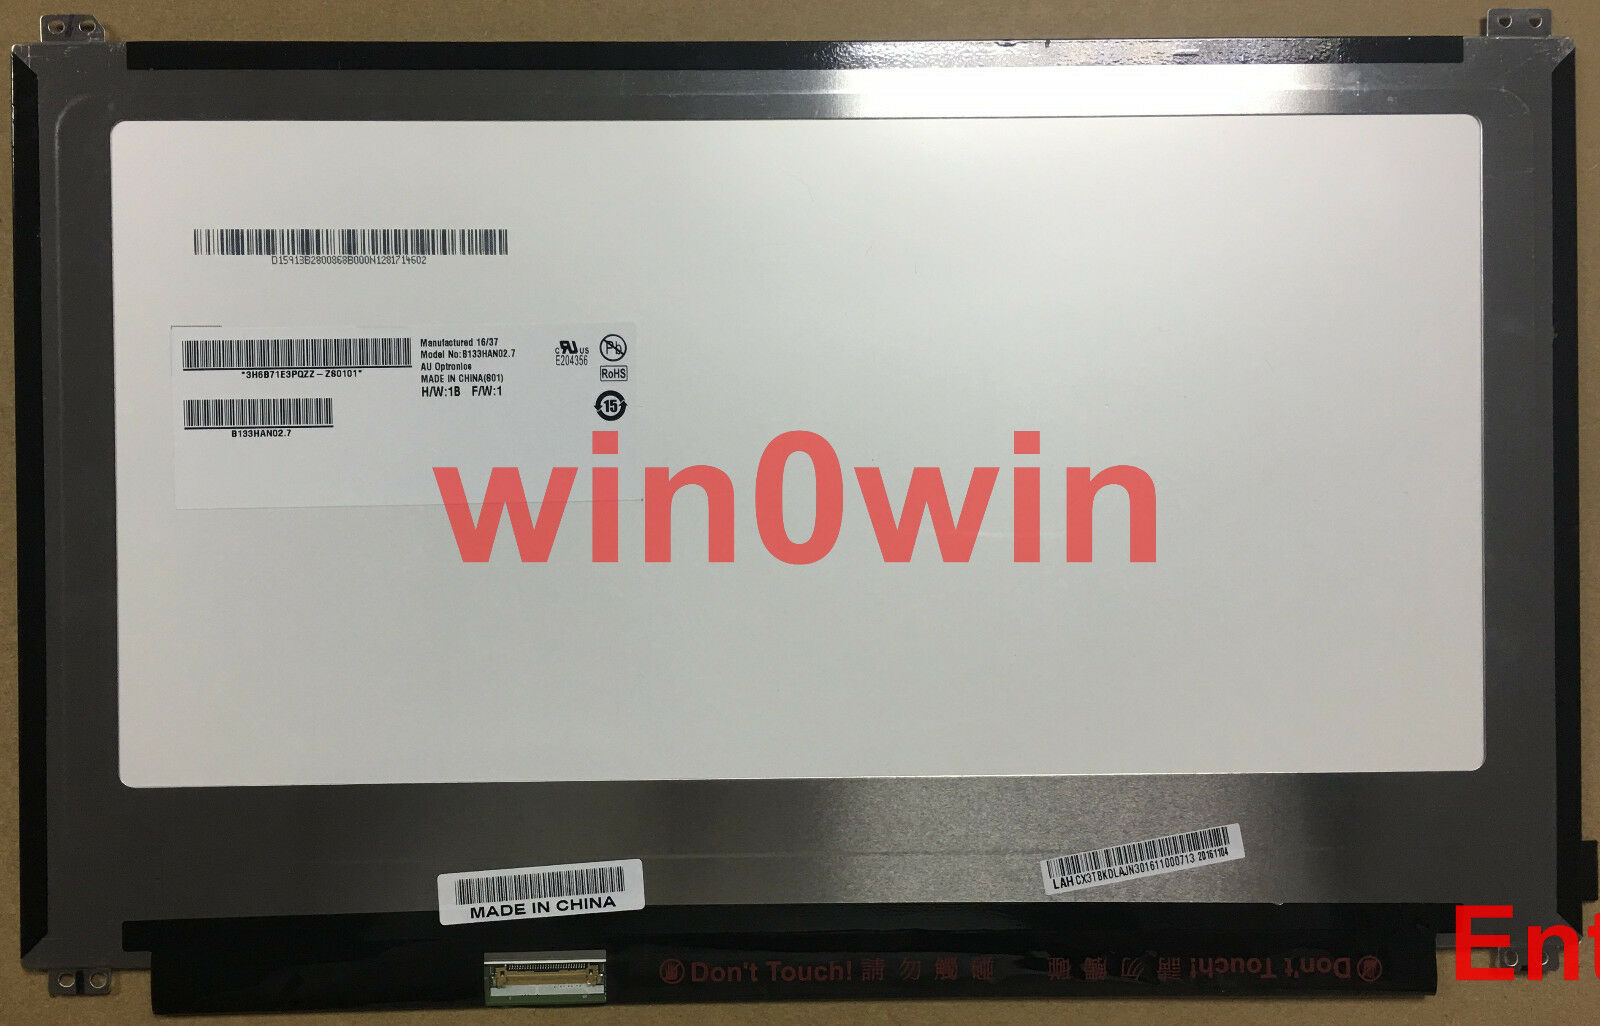 Details About B133HAN027 Fit B133HAN021 133 Inch Slim 30PIN EDP 1920X1080 LED LCD SCREEN